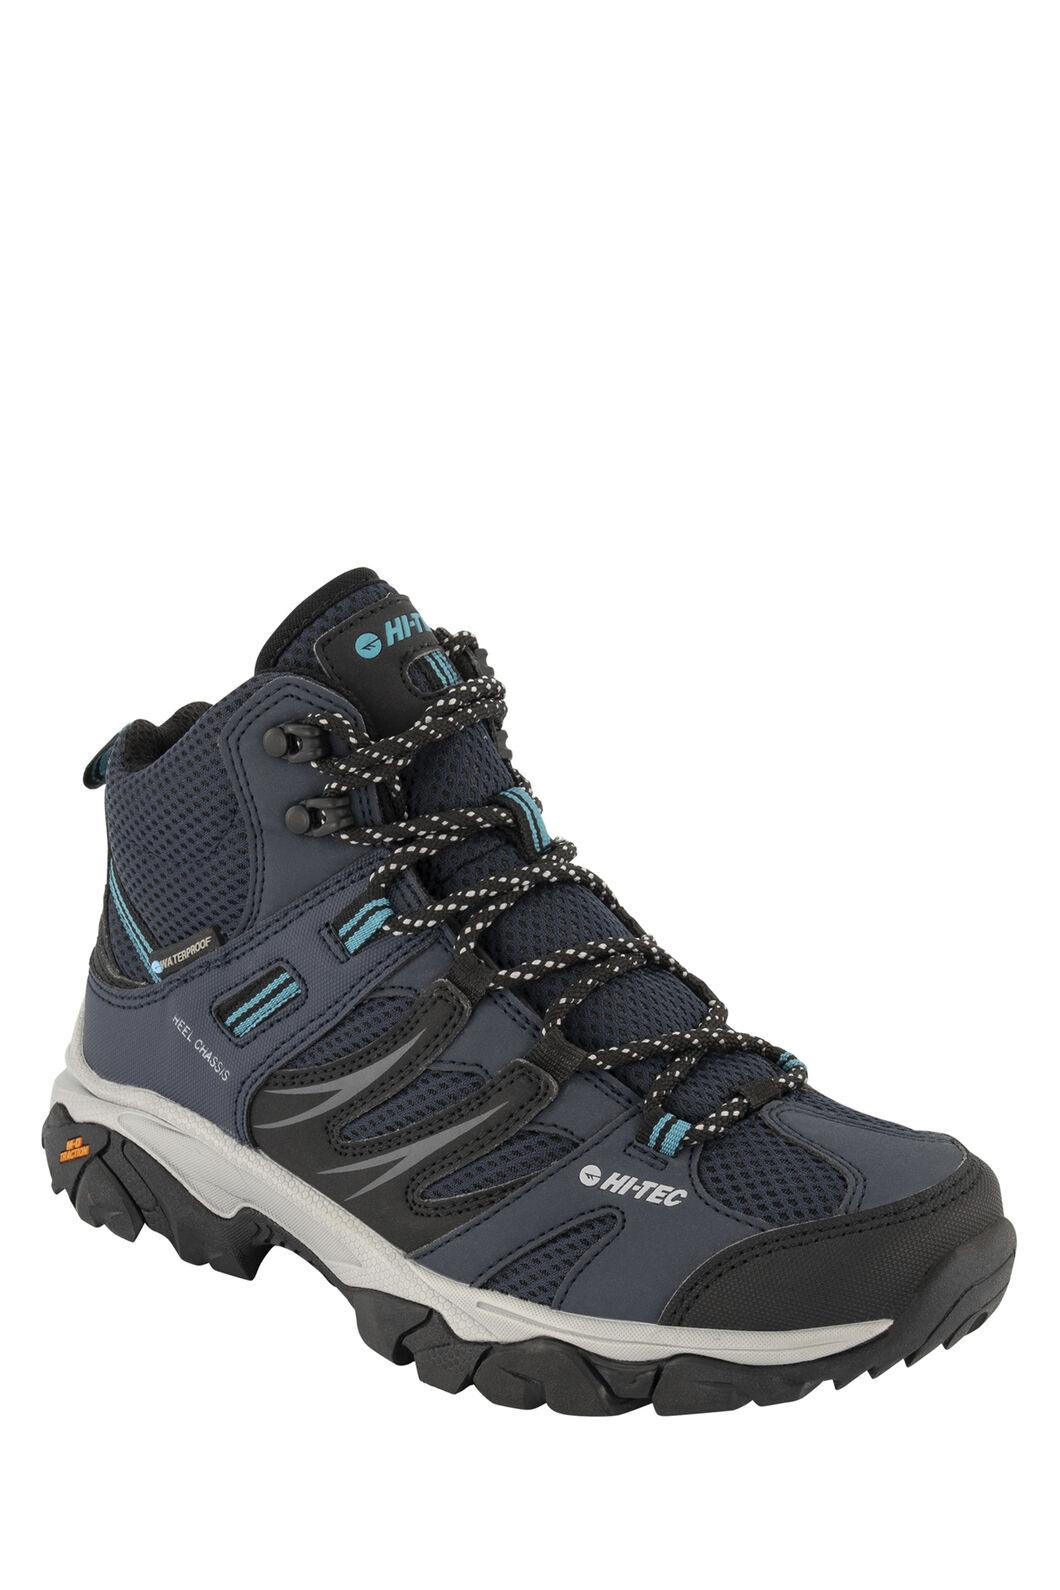 Hi-Tec Women's Tarantula WP Mid Hiking Shoes, Night/Black Navigate, hi-res